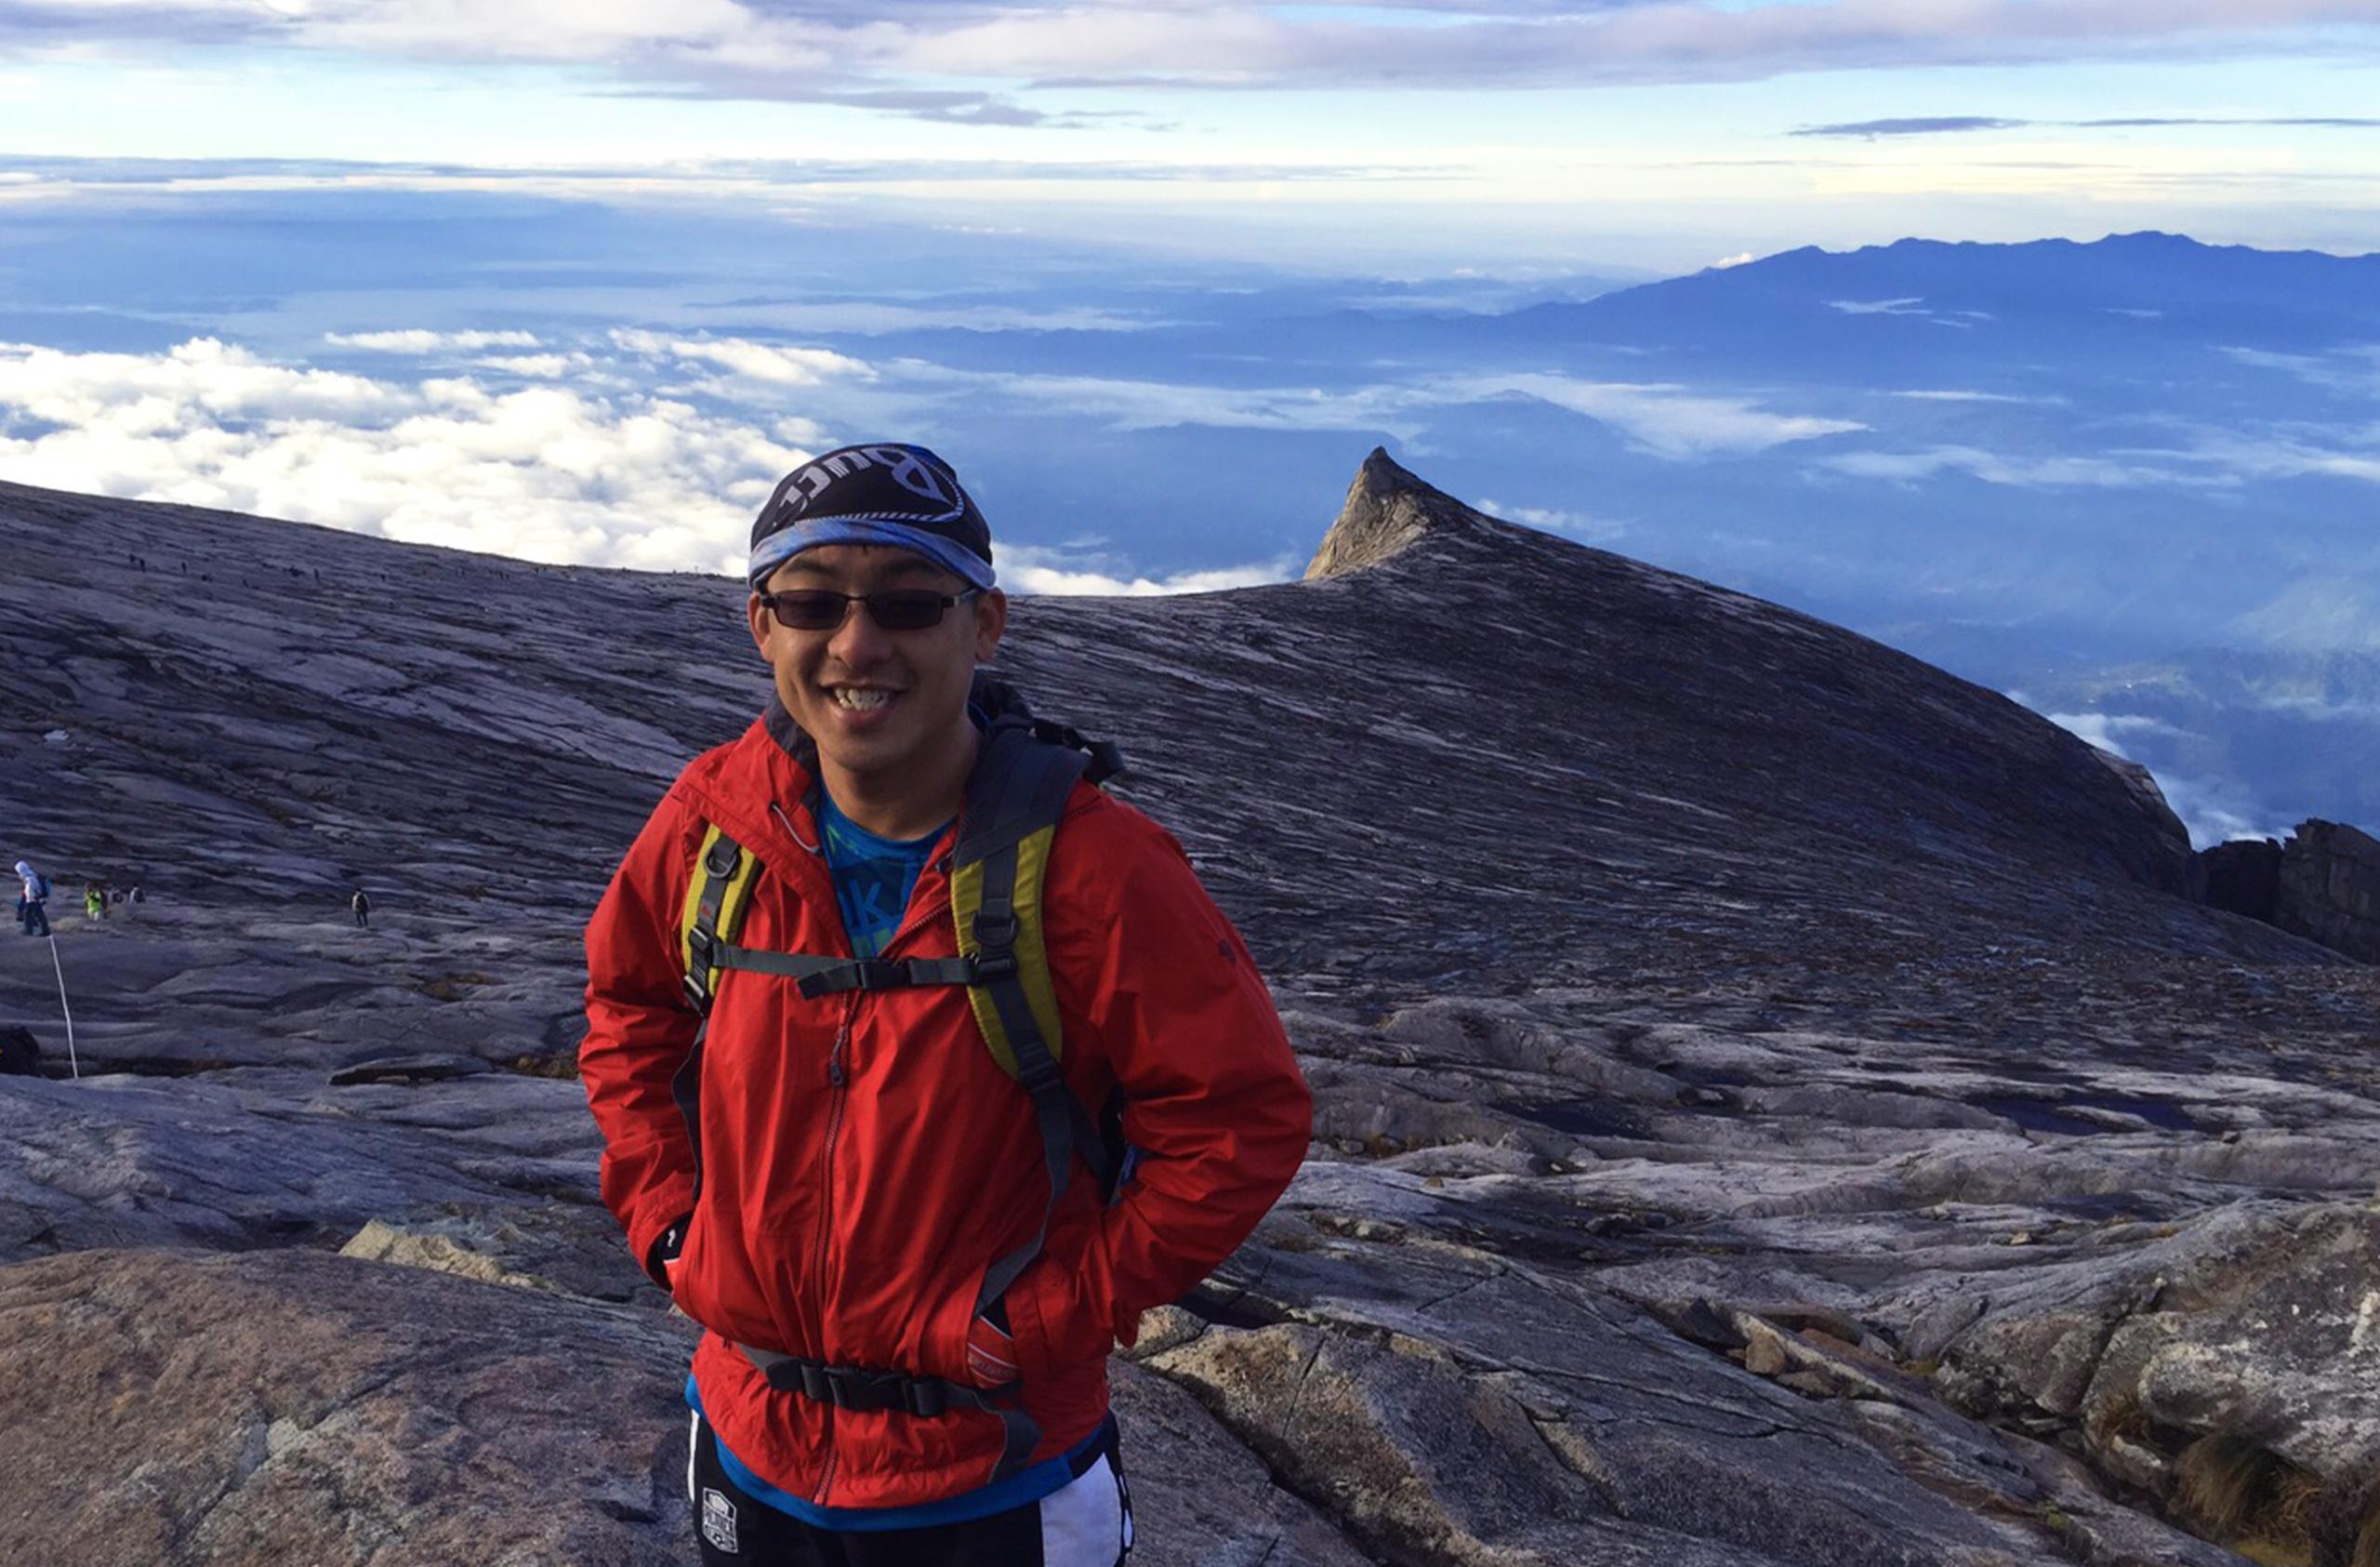 WanderingWally_Explore-KotaKinabalu Mount KK Peak Selfie